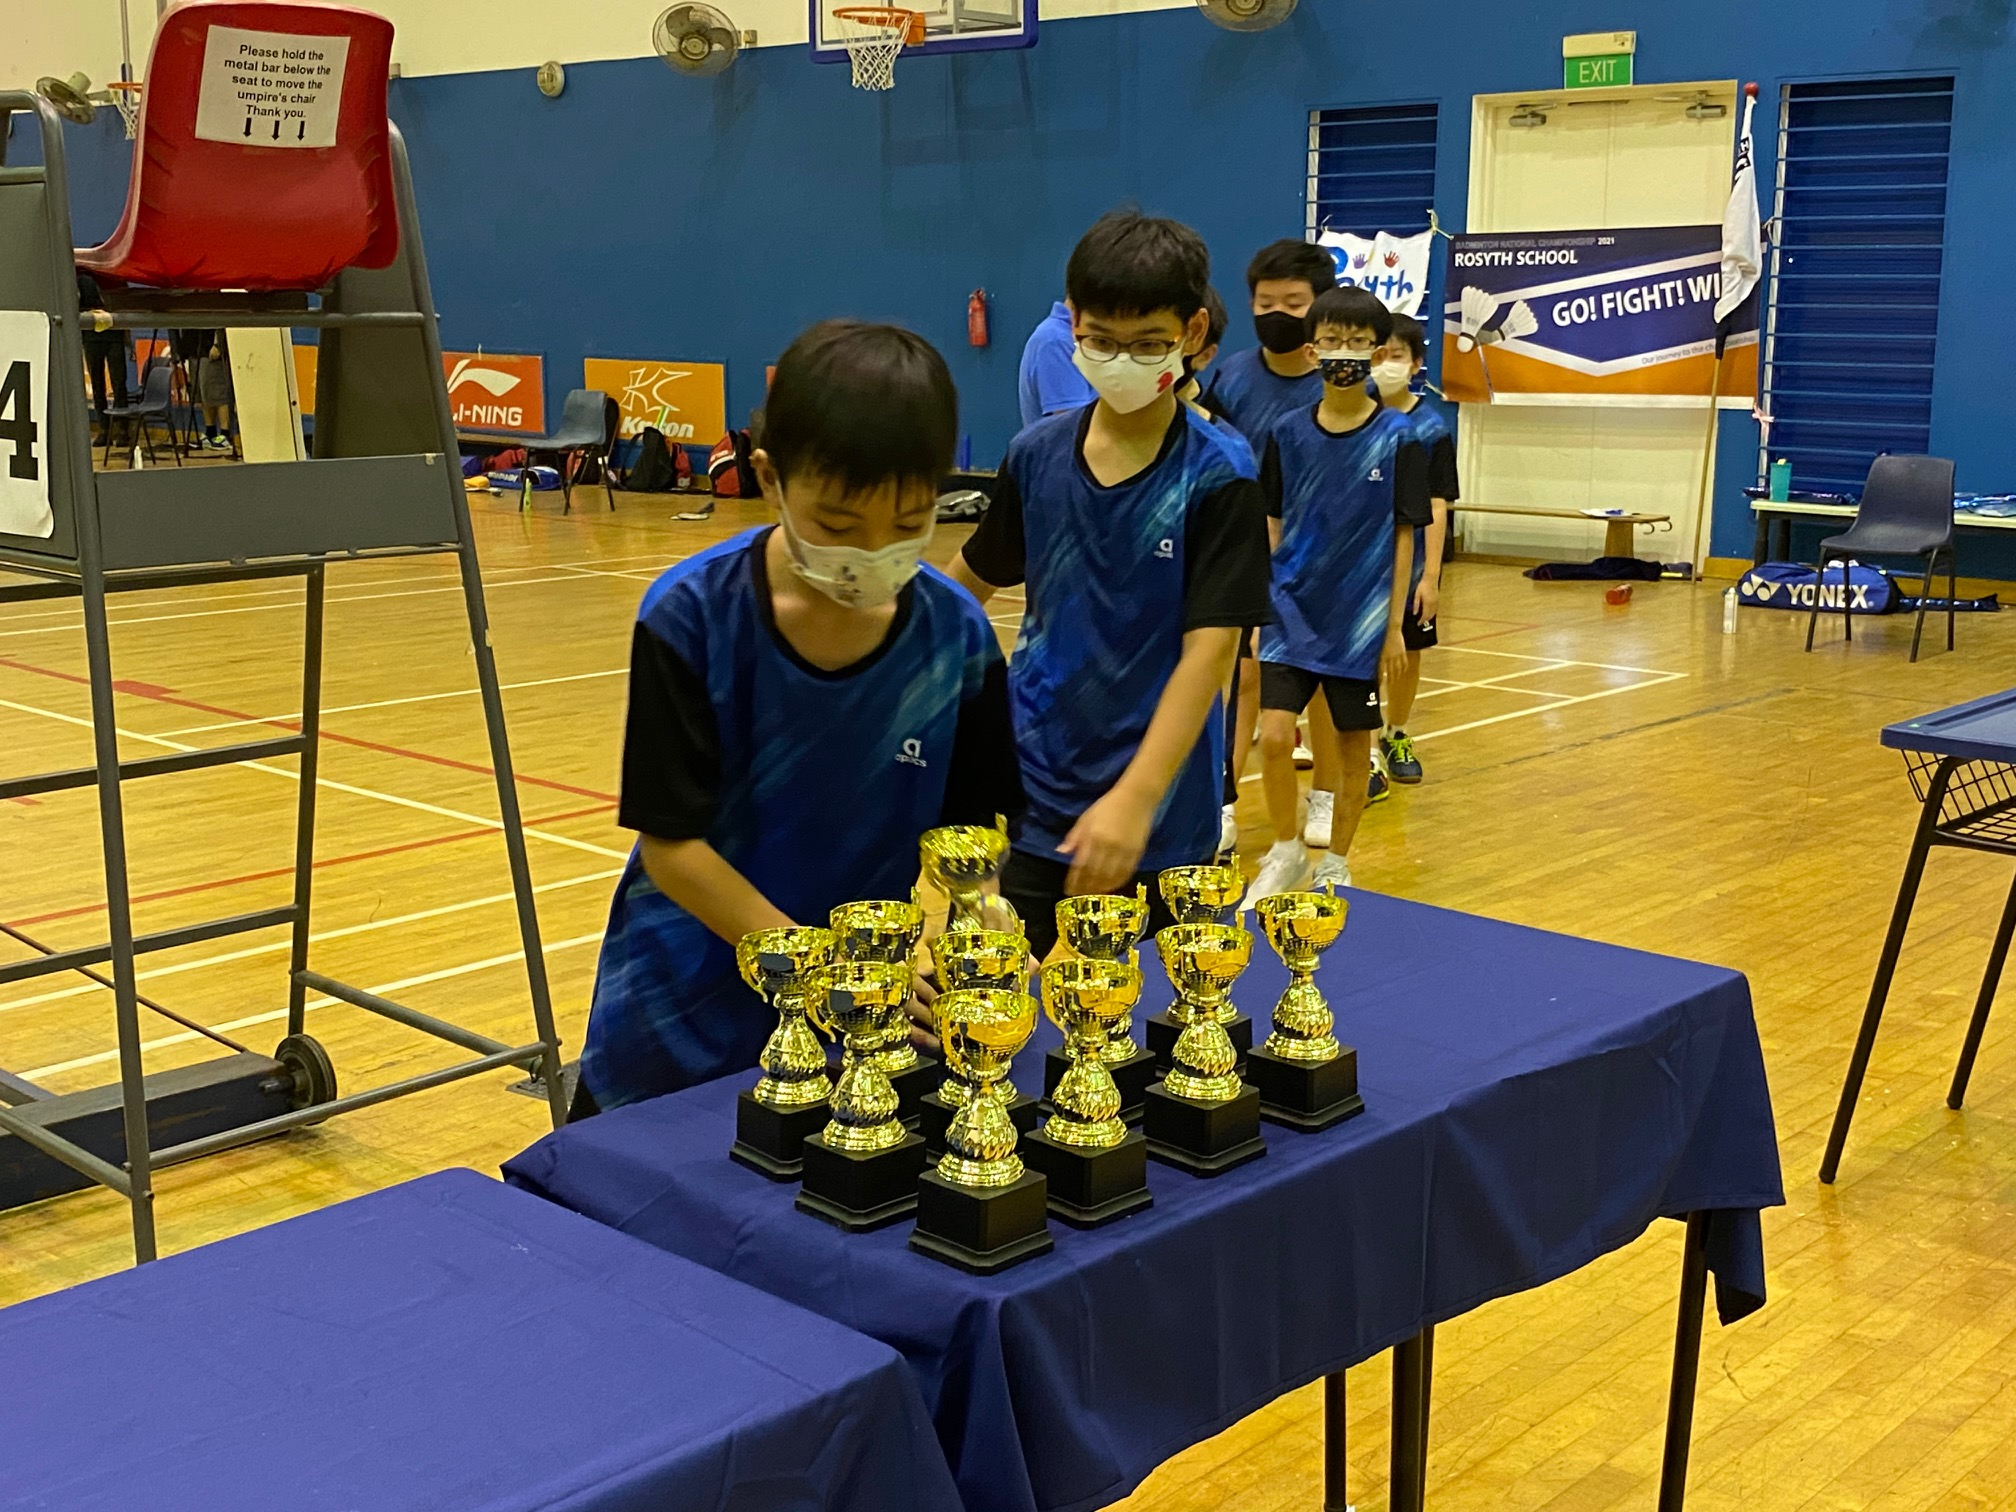 NSG Snr Div North Zone boys' badminton final - Rosyth players getting their trophies